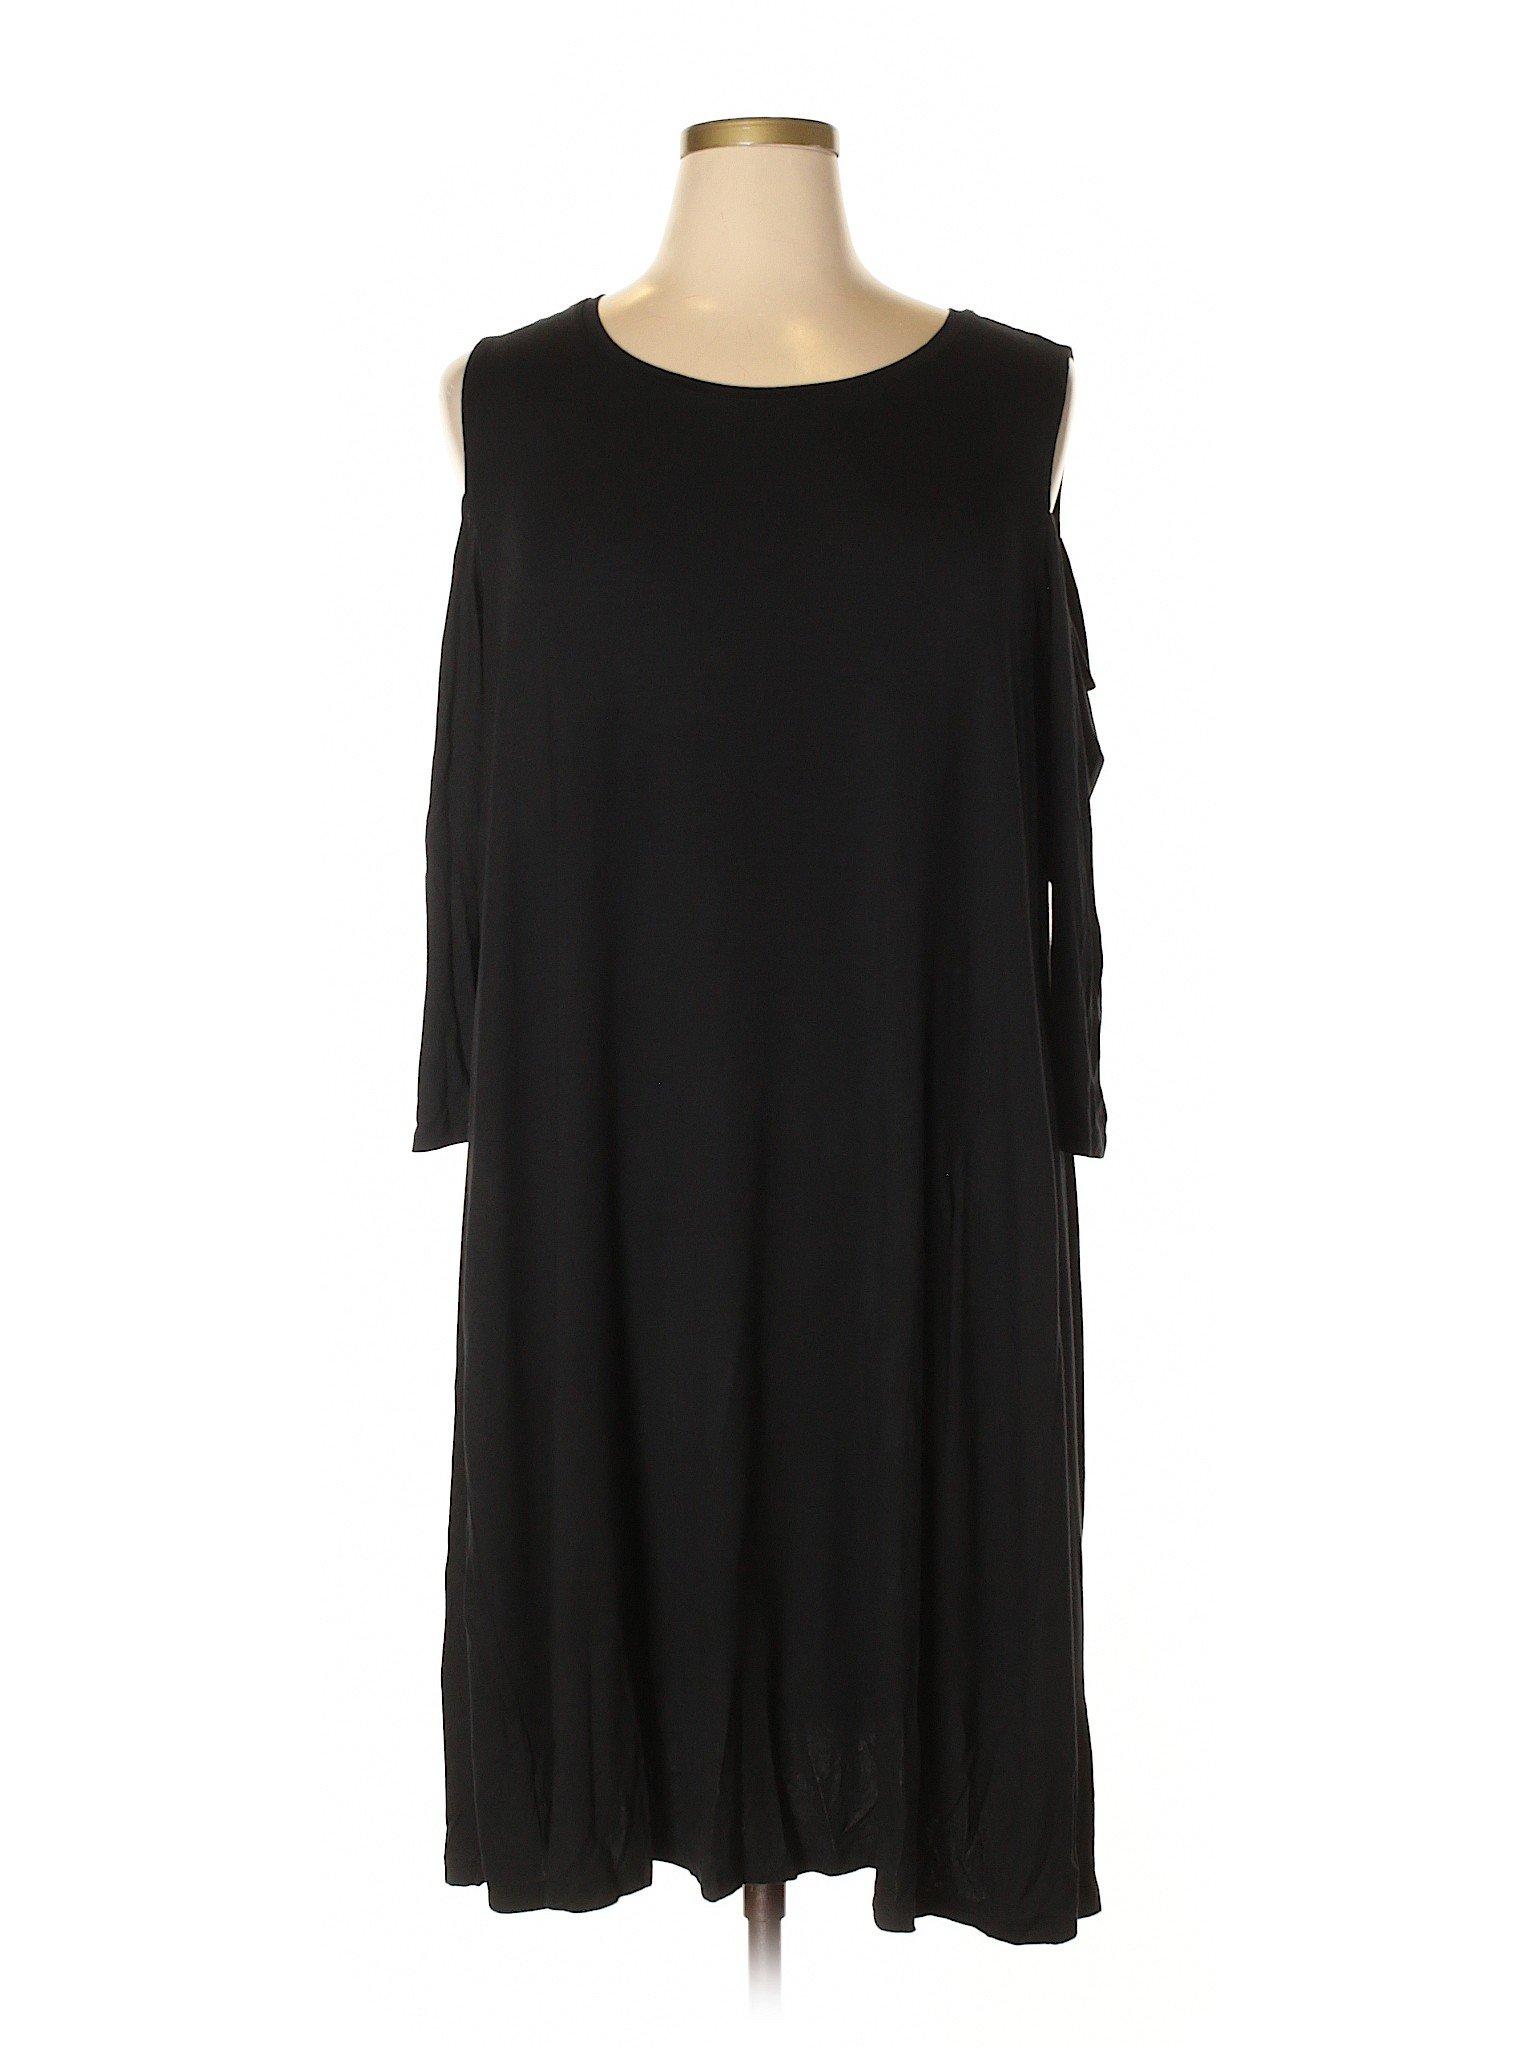 Style Dress Casual amp;Co Boutique winter aU5qw0xW